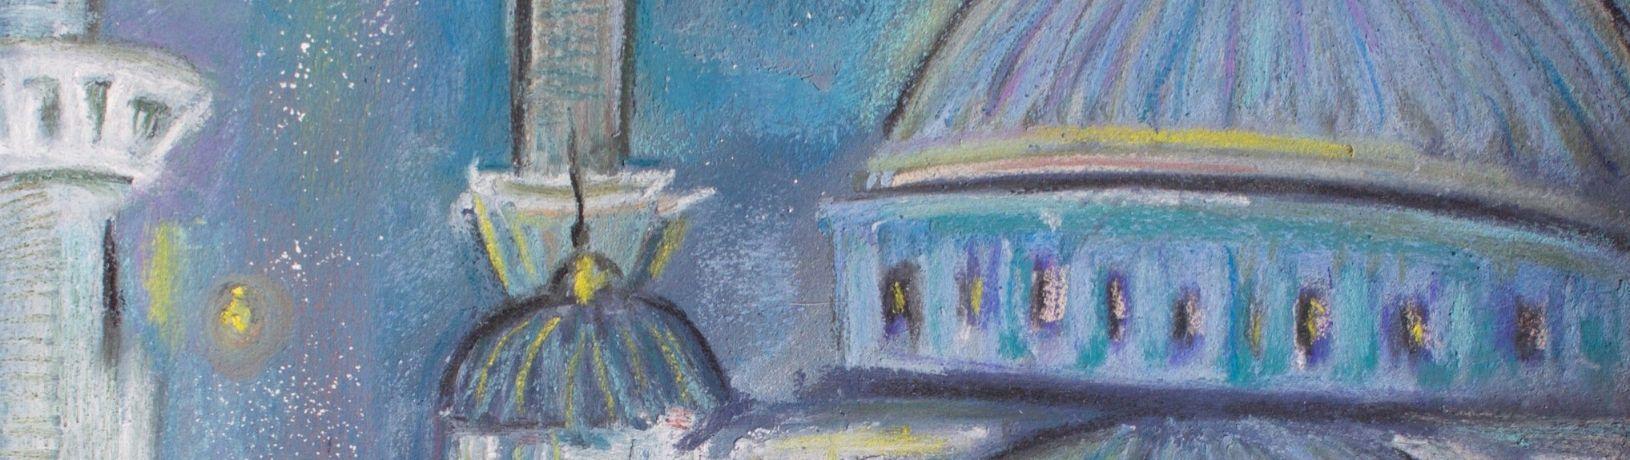 subheader for Ramadan exhibition with Blue Mosque artwork